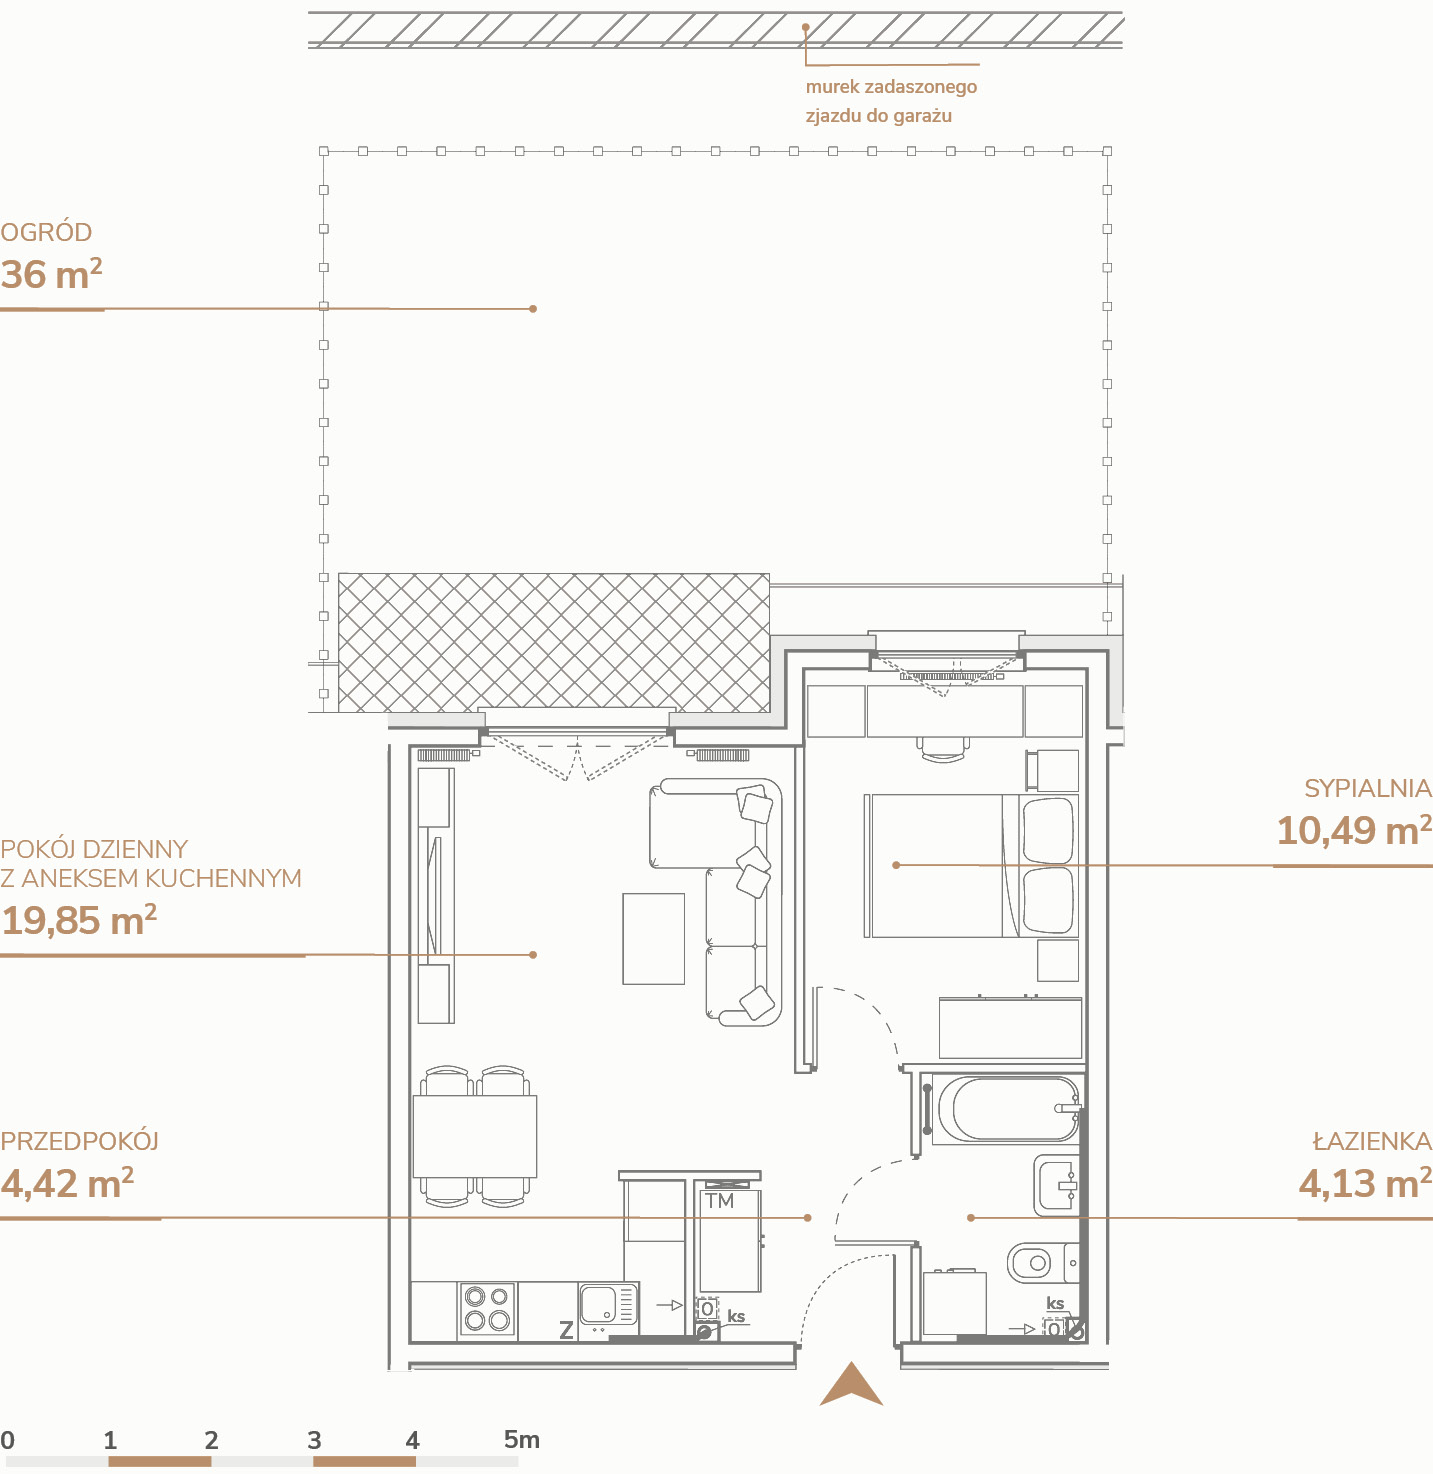 Mieszkanie B1.0.2